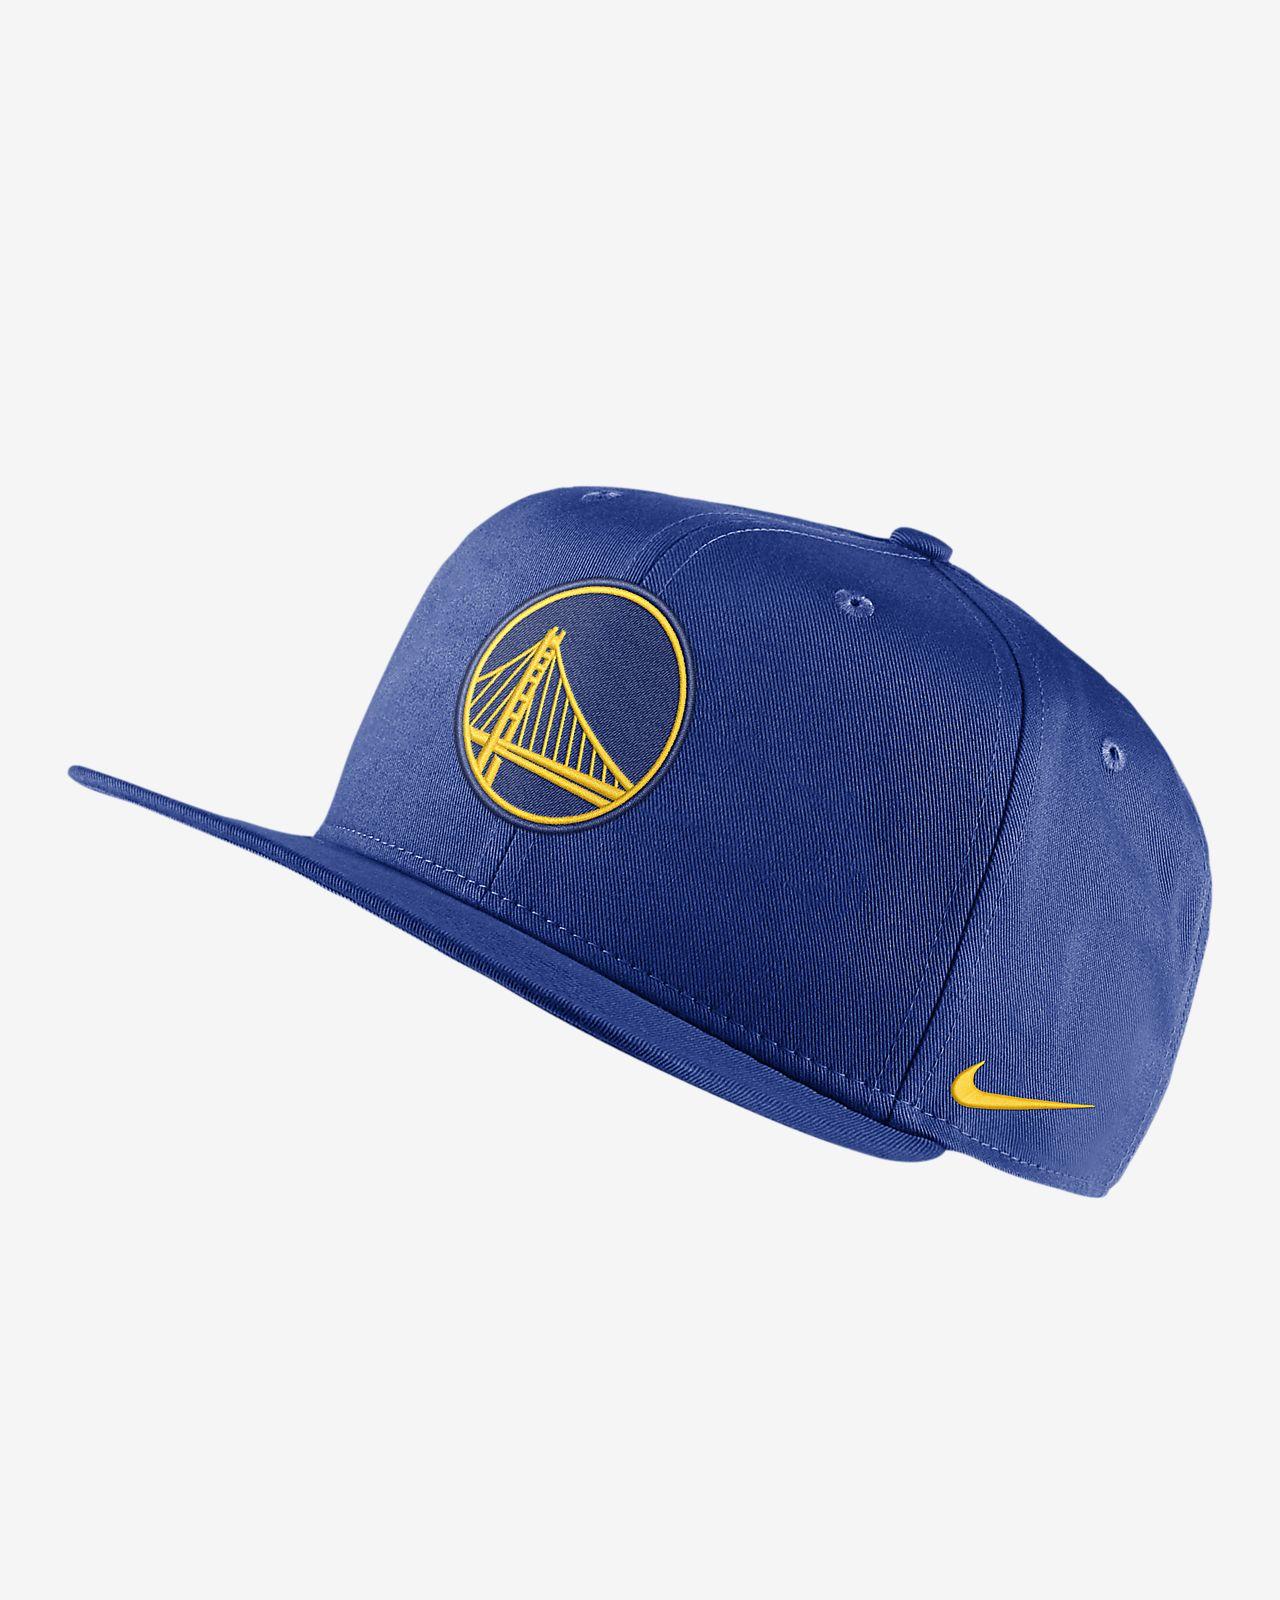 Golden State Warriors Nike Pro NBA caps